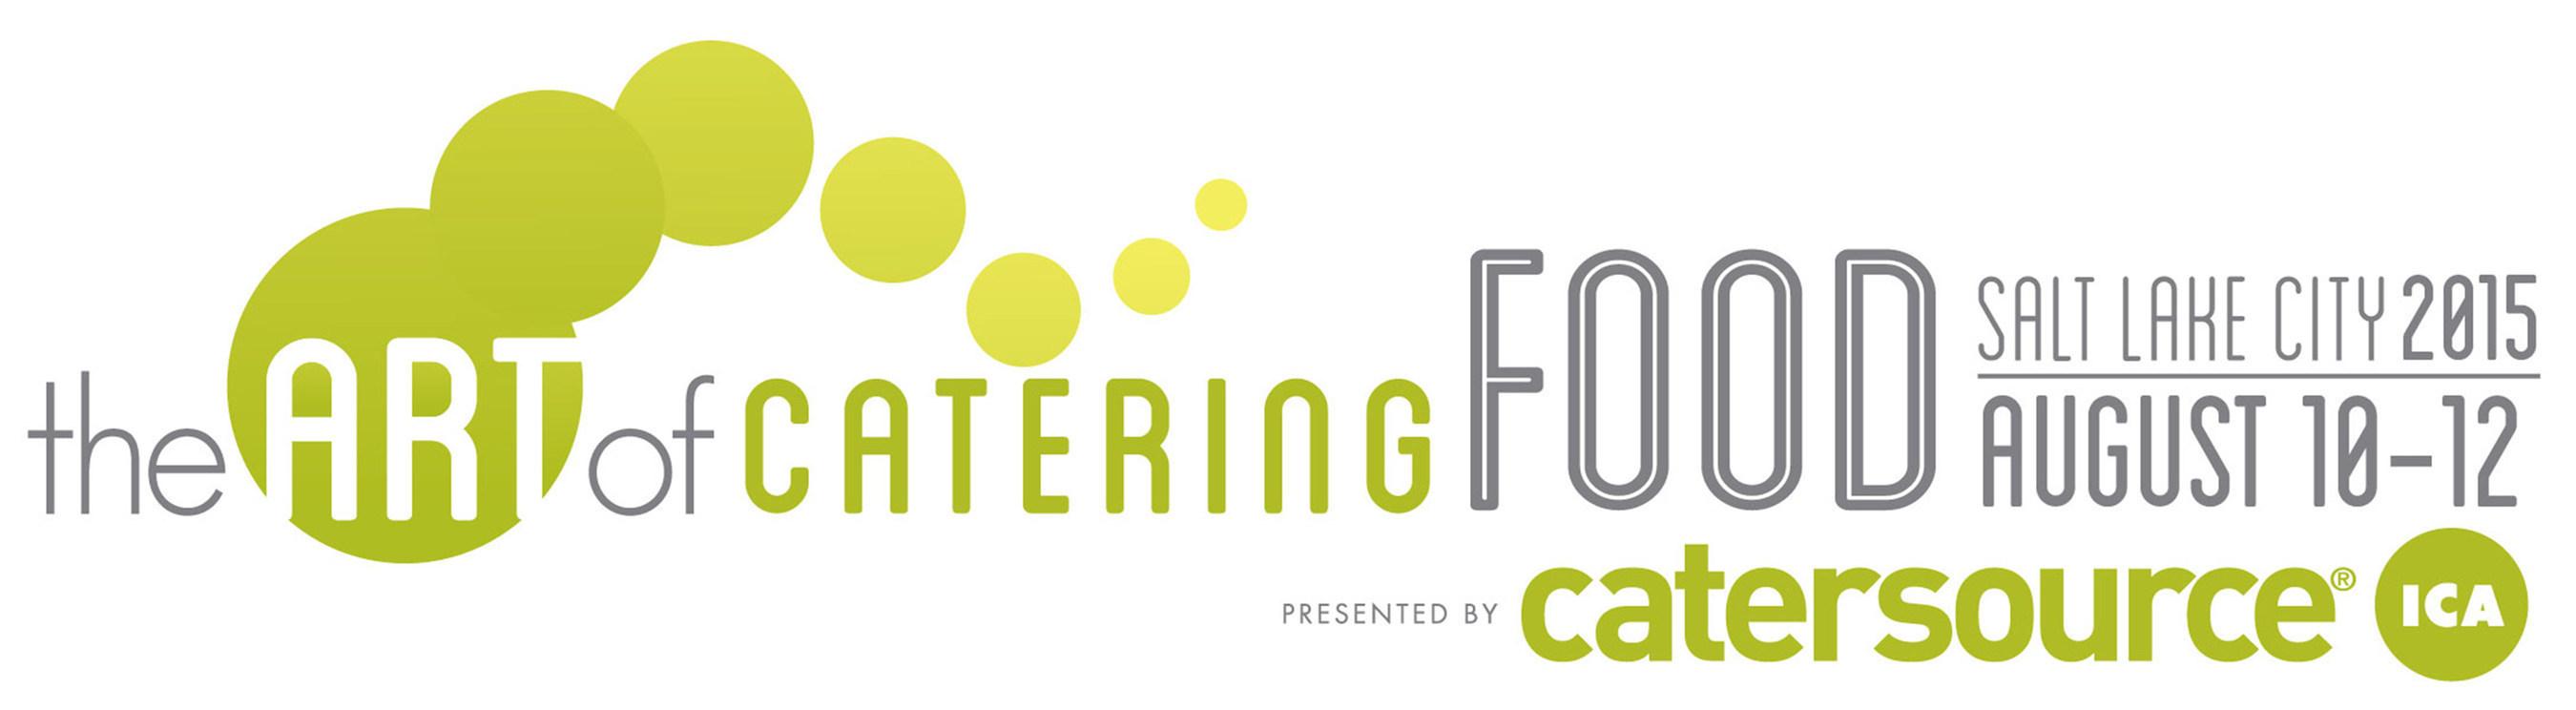 The Art of Catering Food   August 10-12, 2015   Salt Lake City, UT